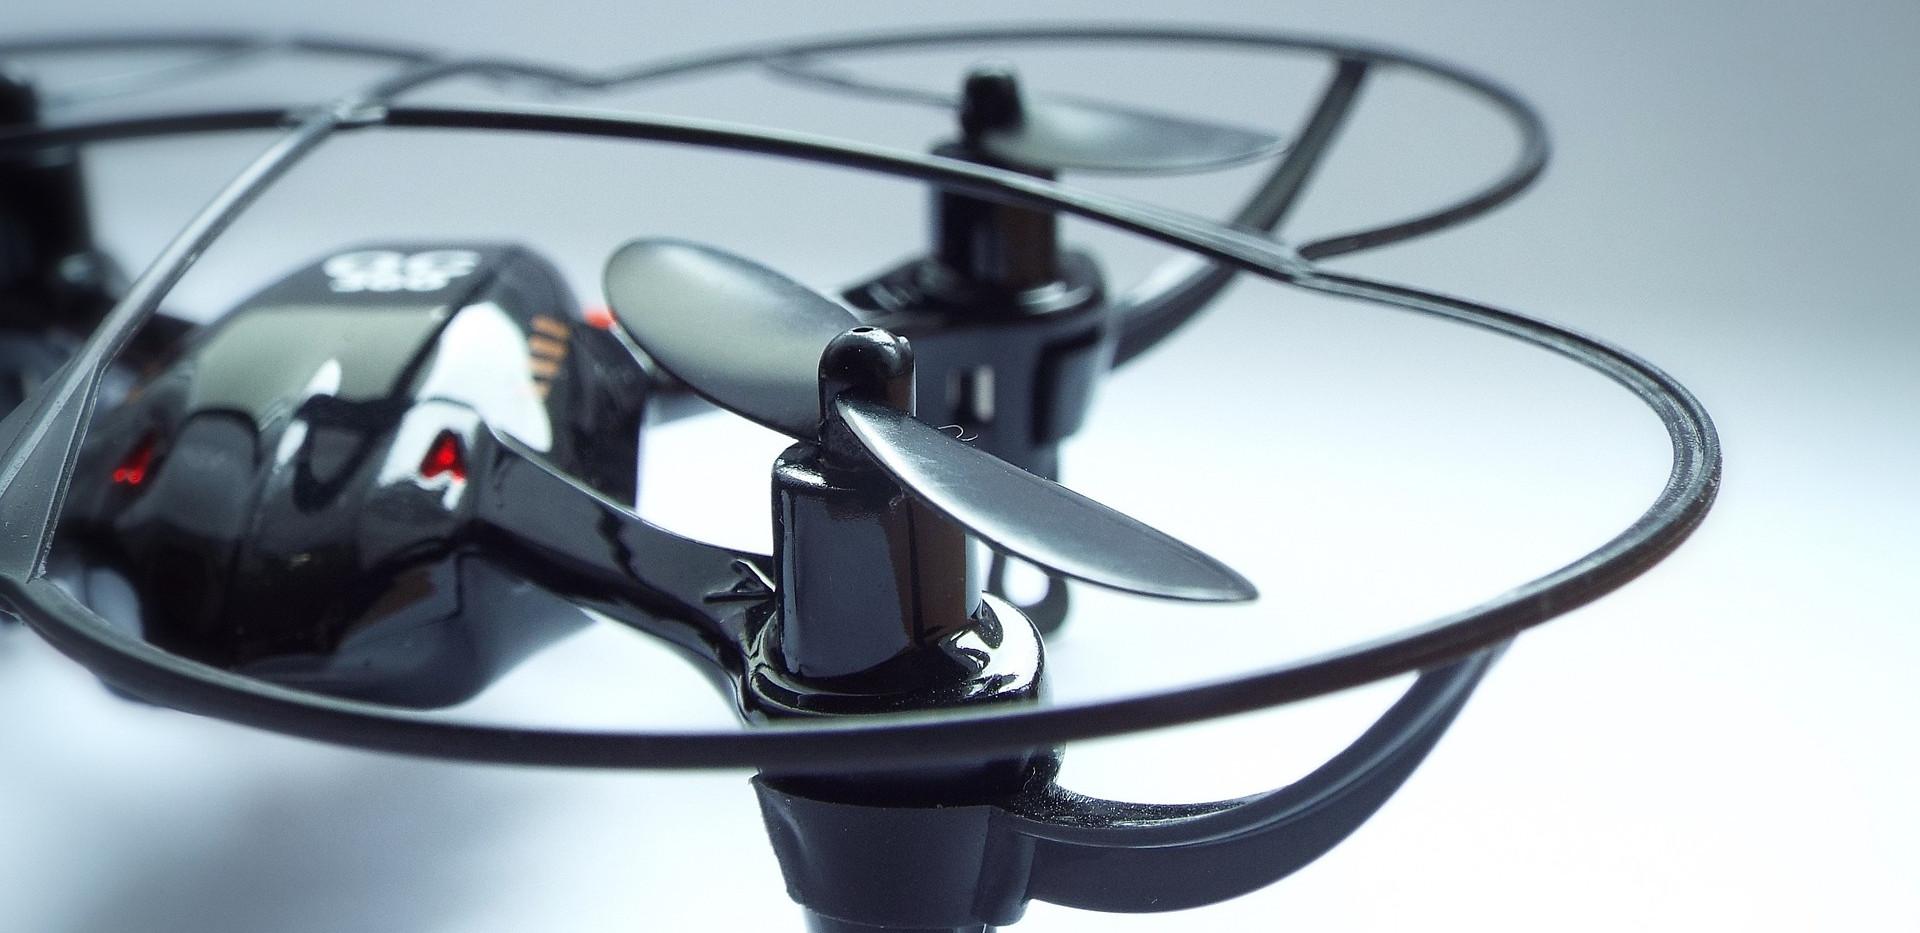 drone-16.jpg